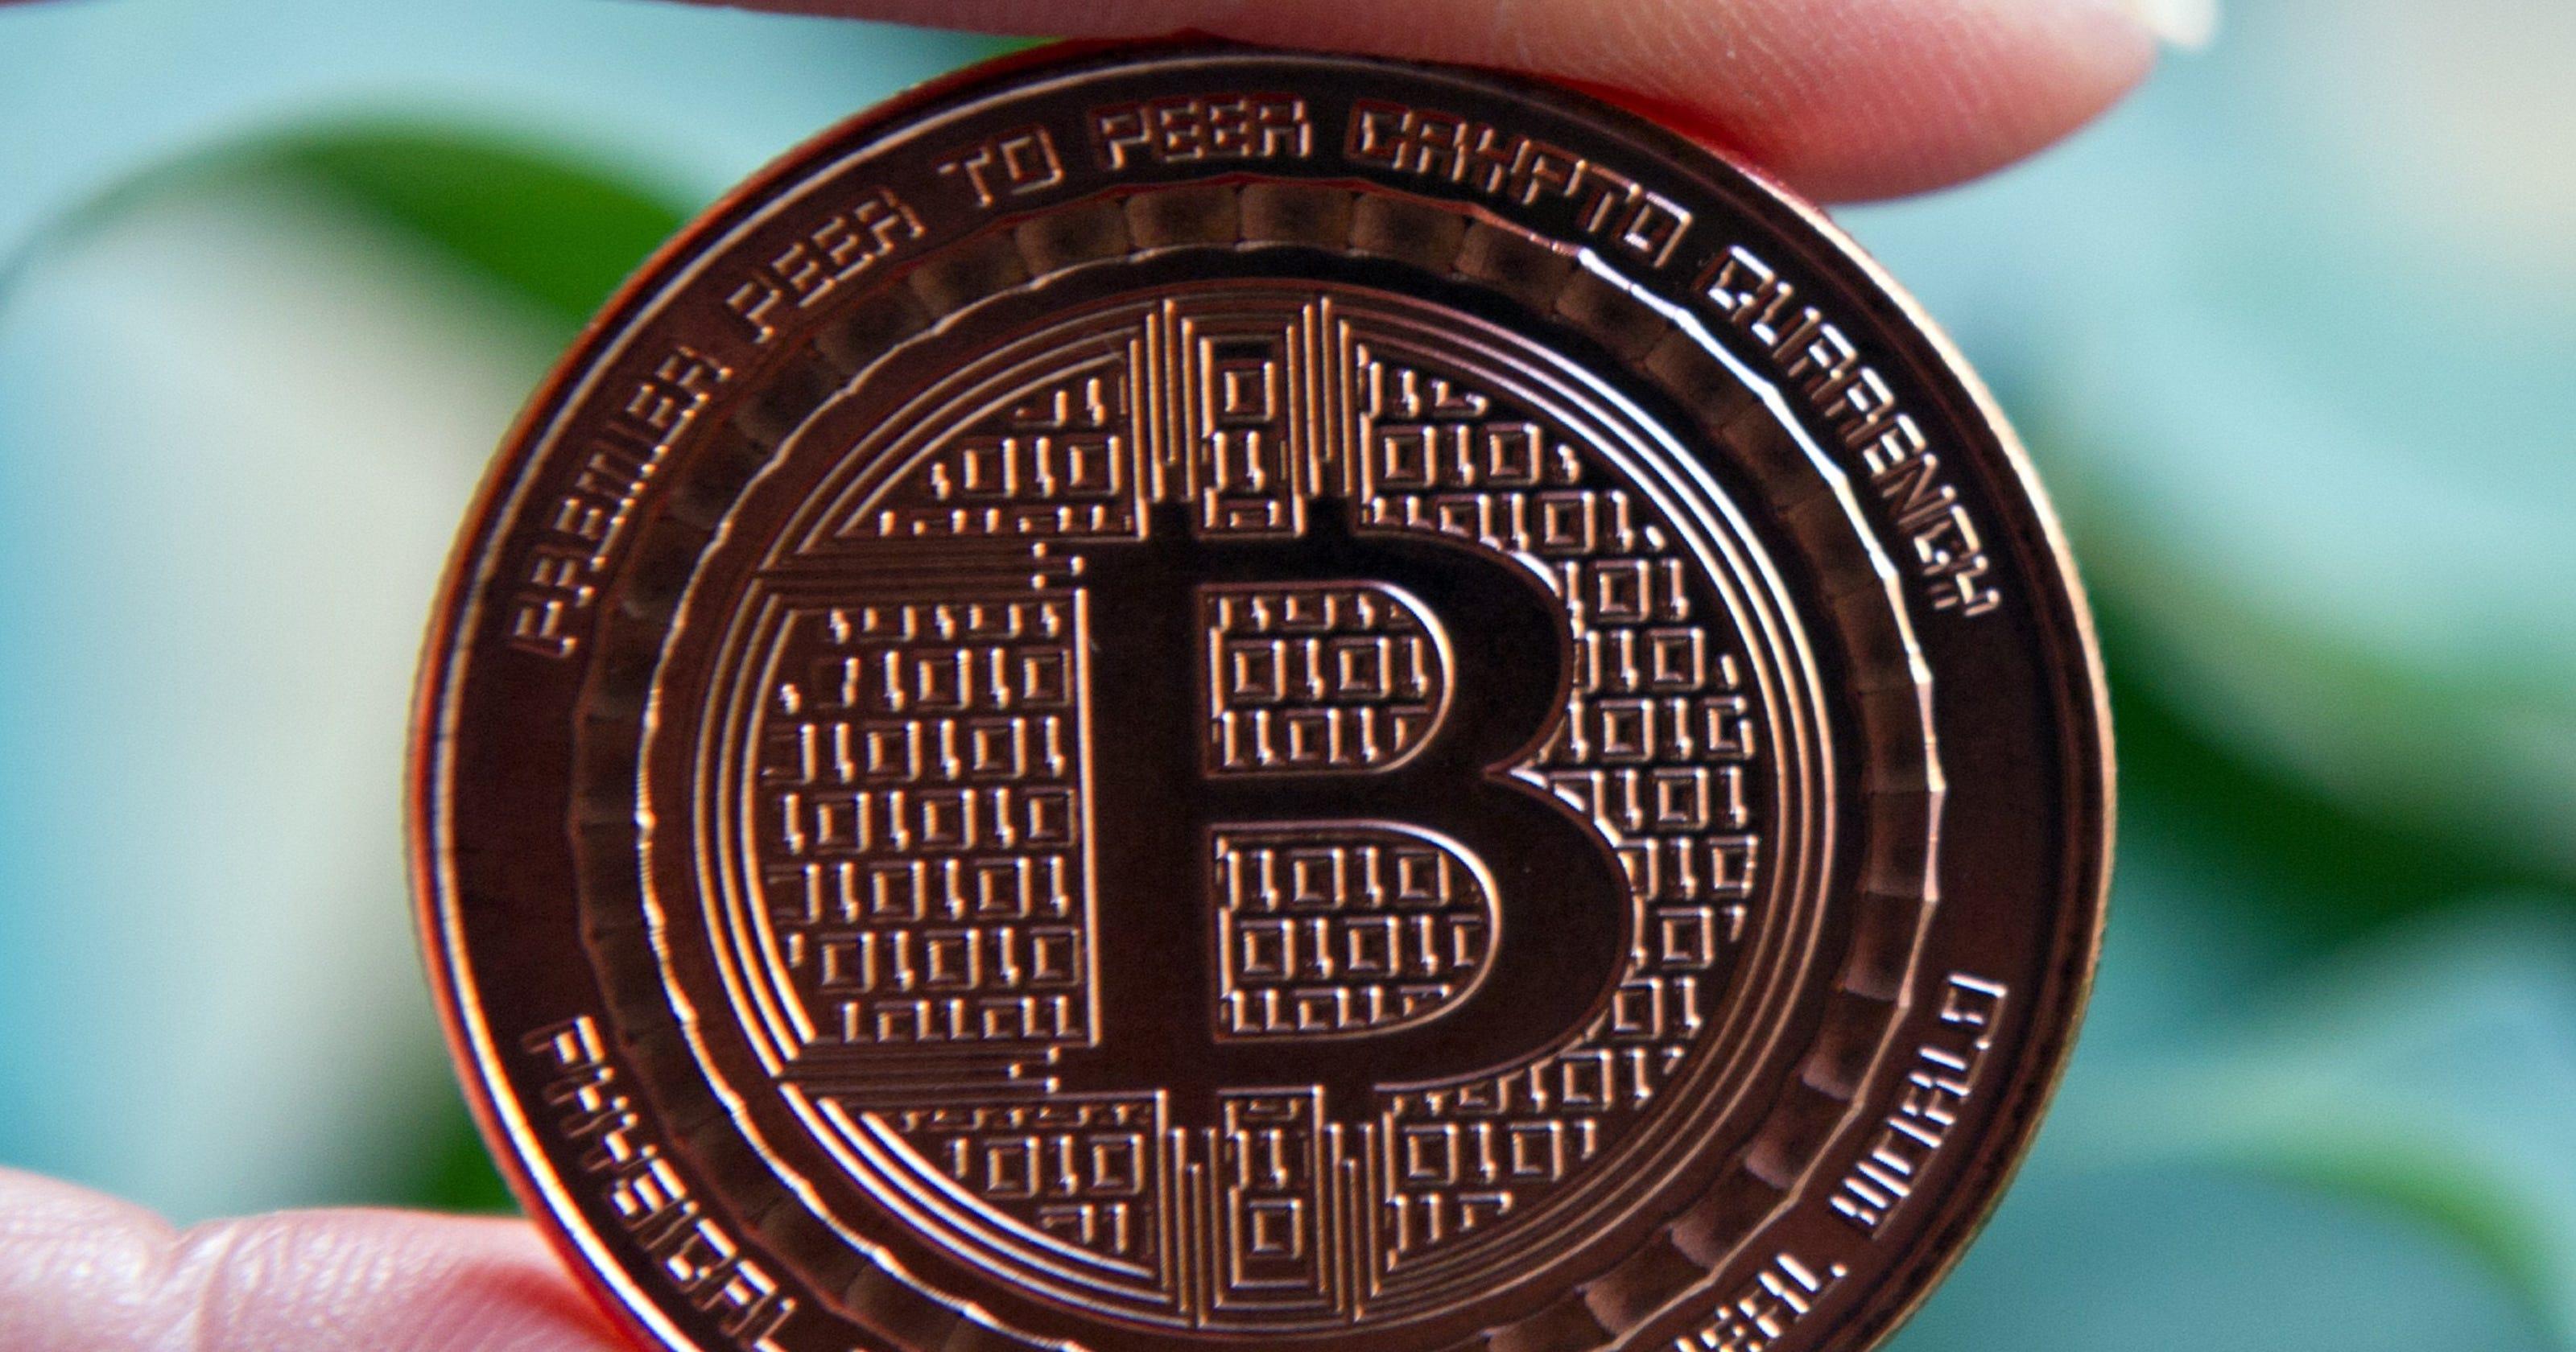 Nordic exchange bitcoins betfair australia lay betting horses